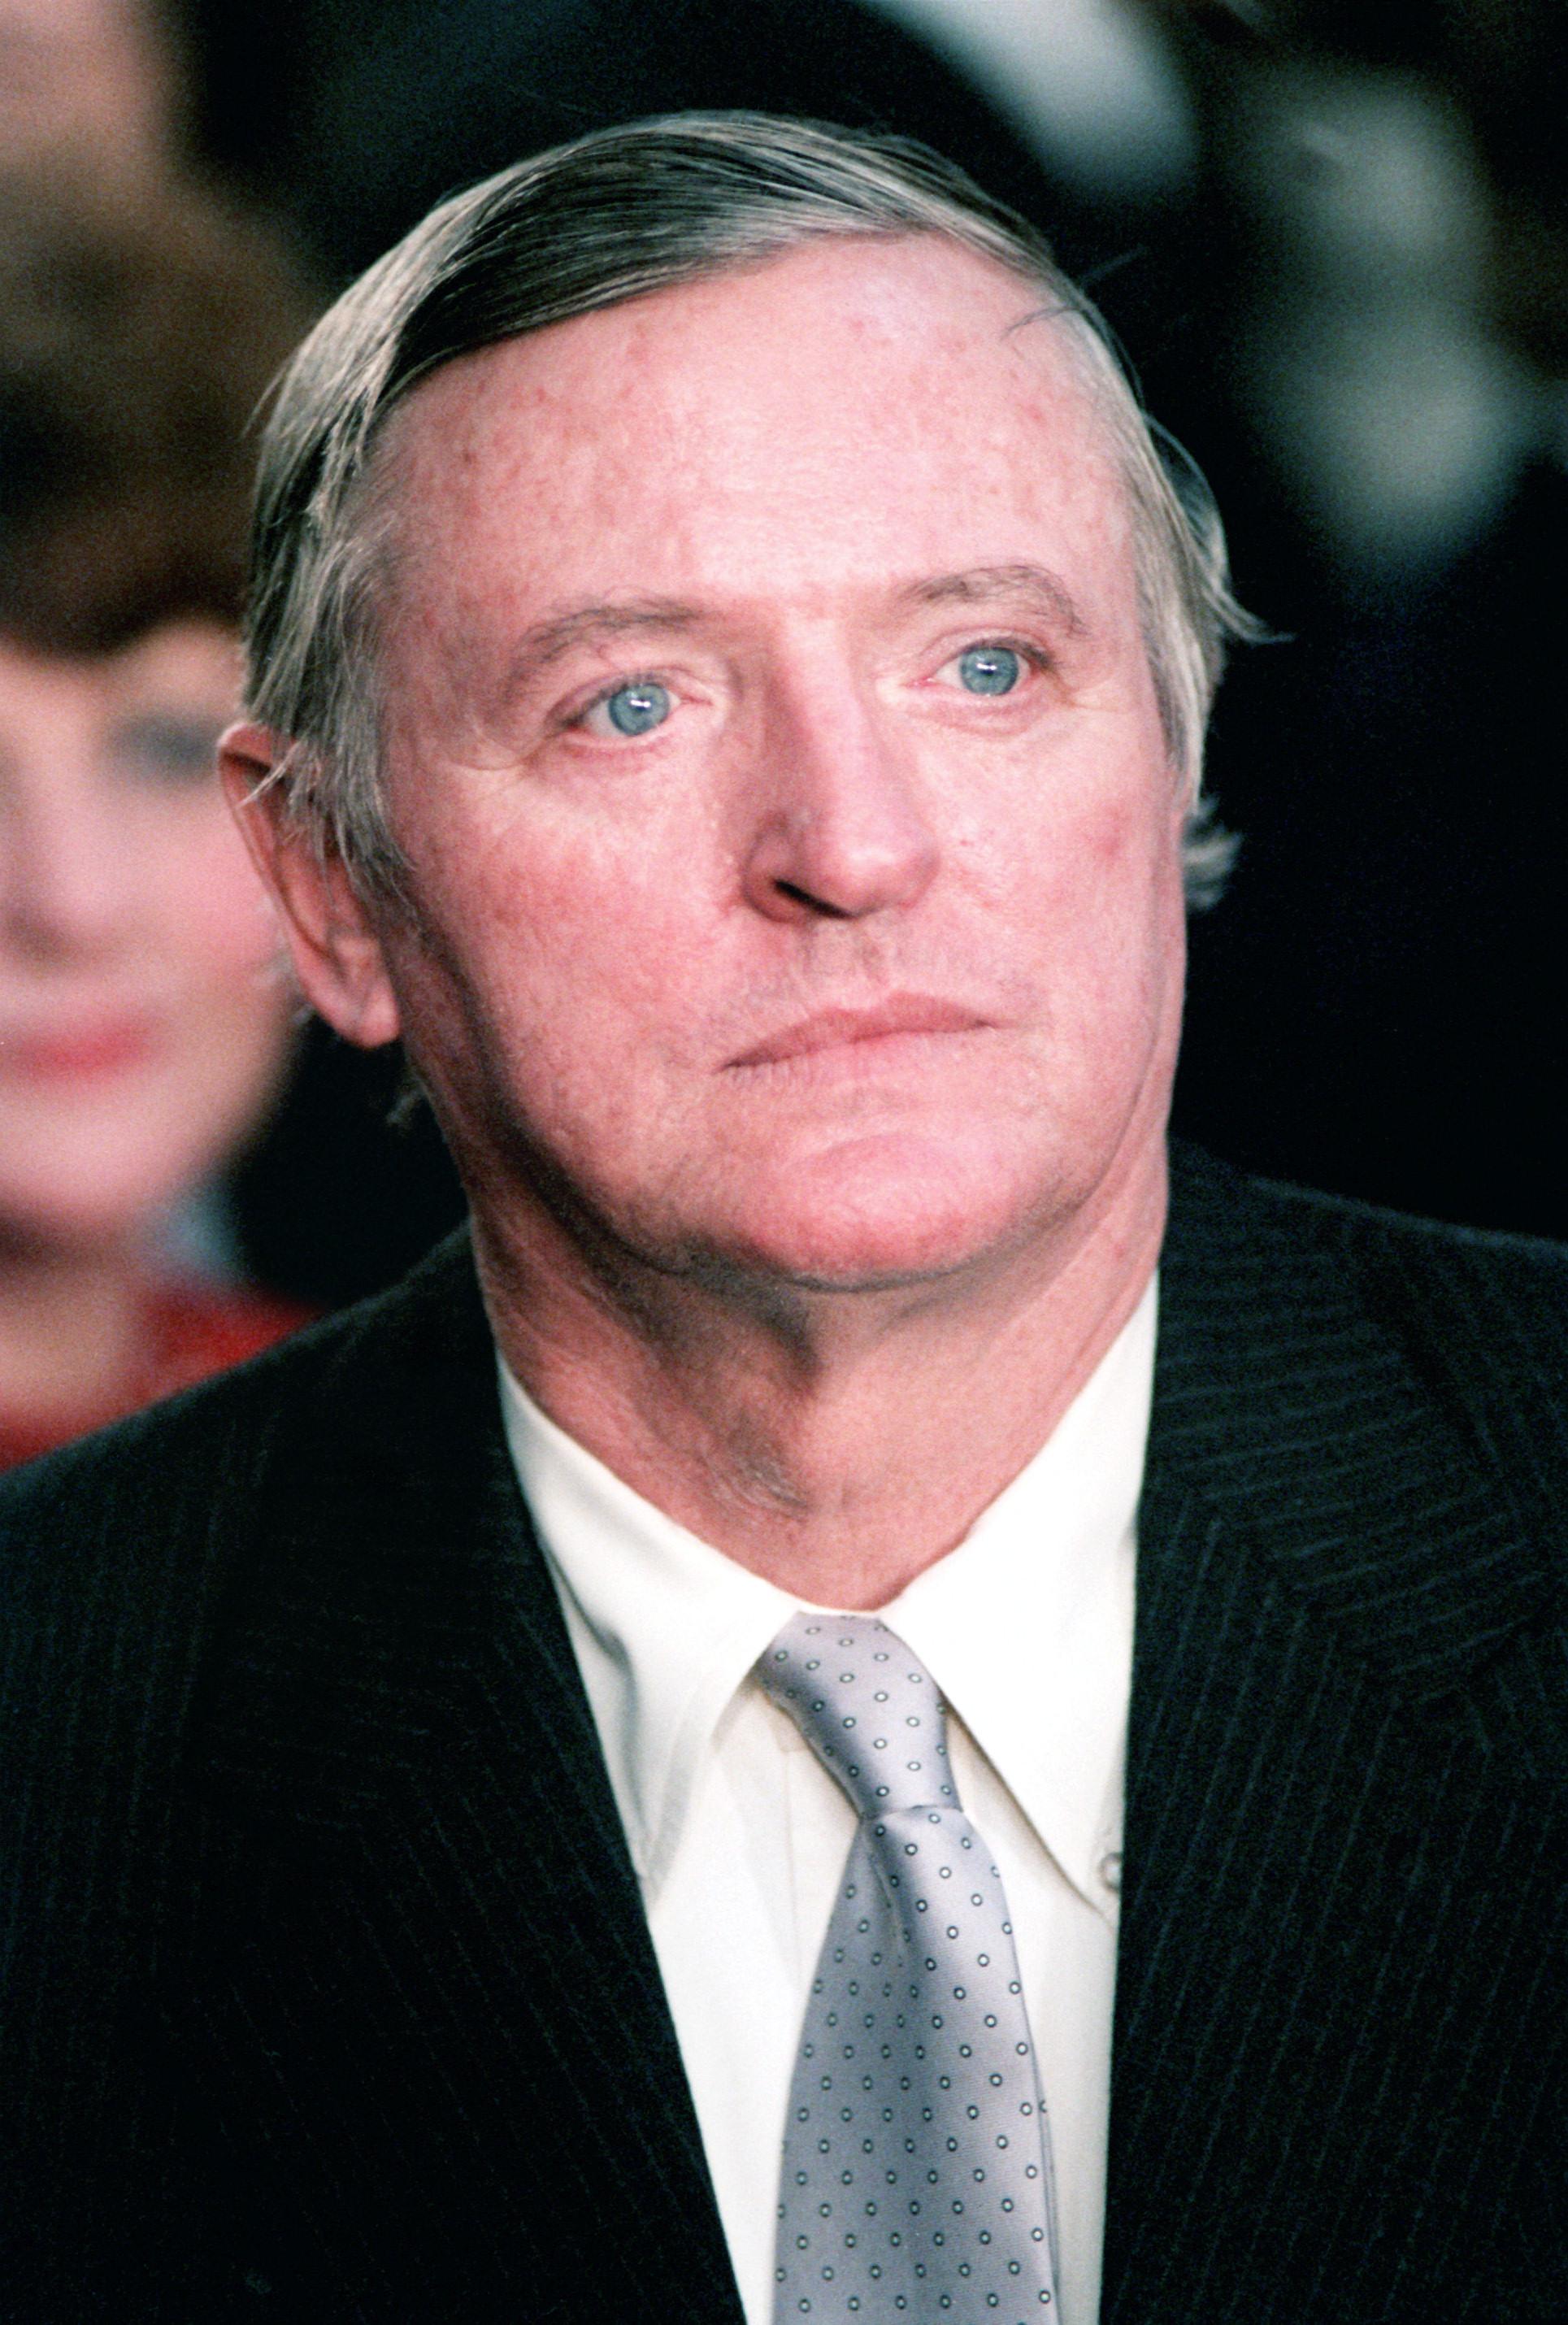 William F. Buckley, Jr.'s quote #2